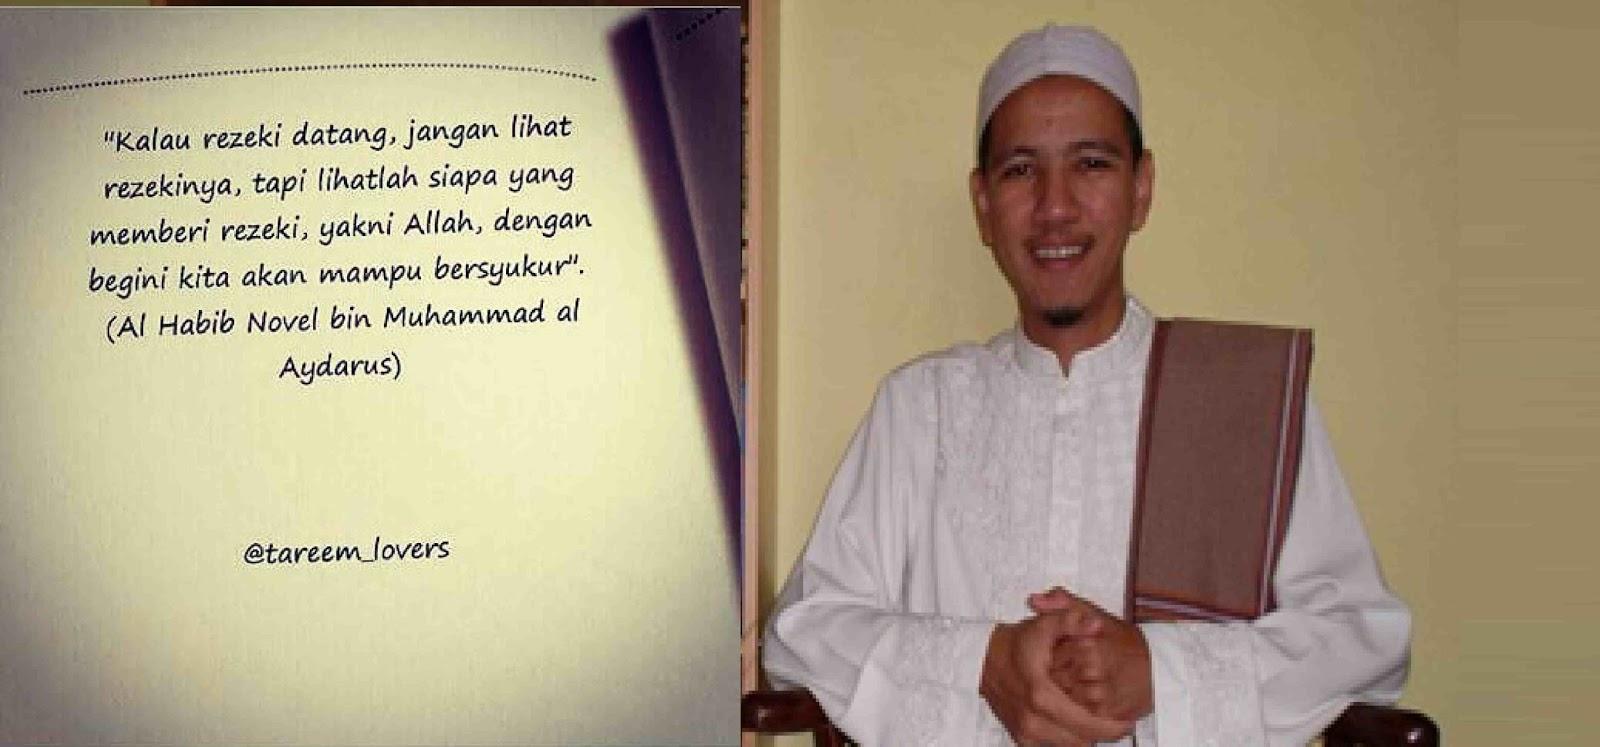 Kata Mutiara Nasehat Dari Al Habib Novel Bin Muhammad Al Aydarus